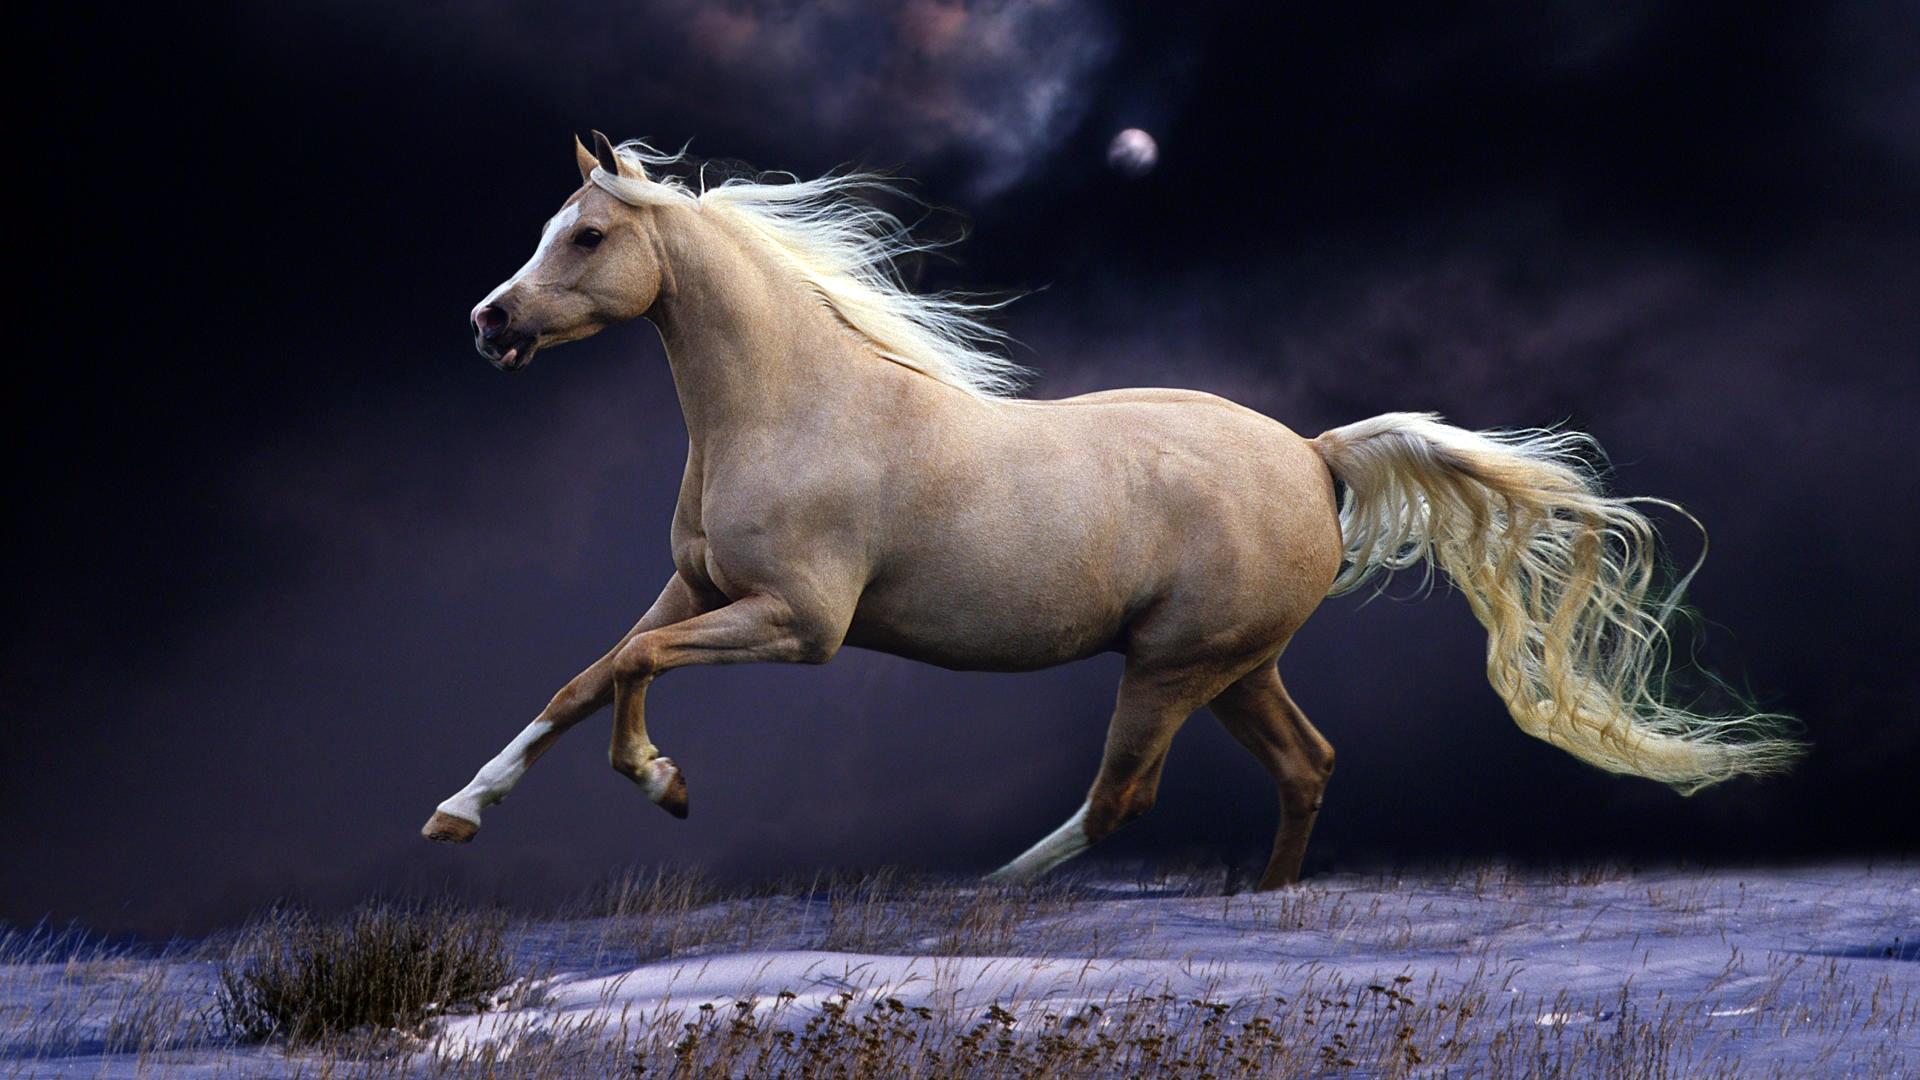 Download Wallpaper 1920x1080 Horse Mane Running Beautiful